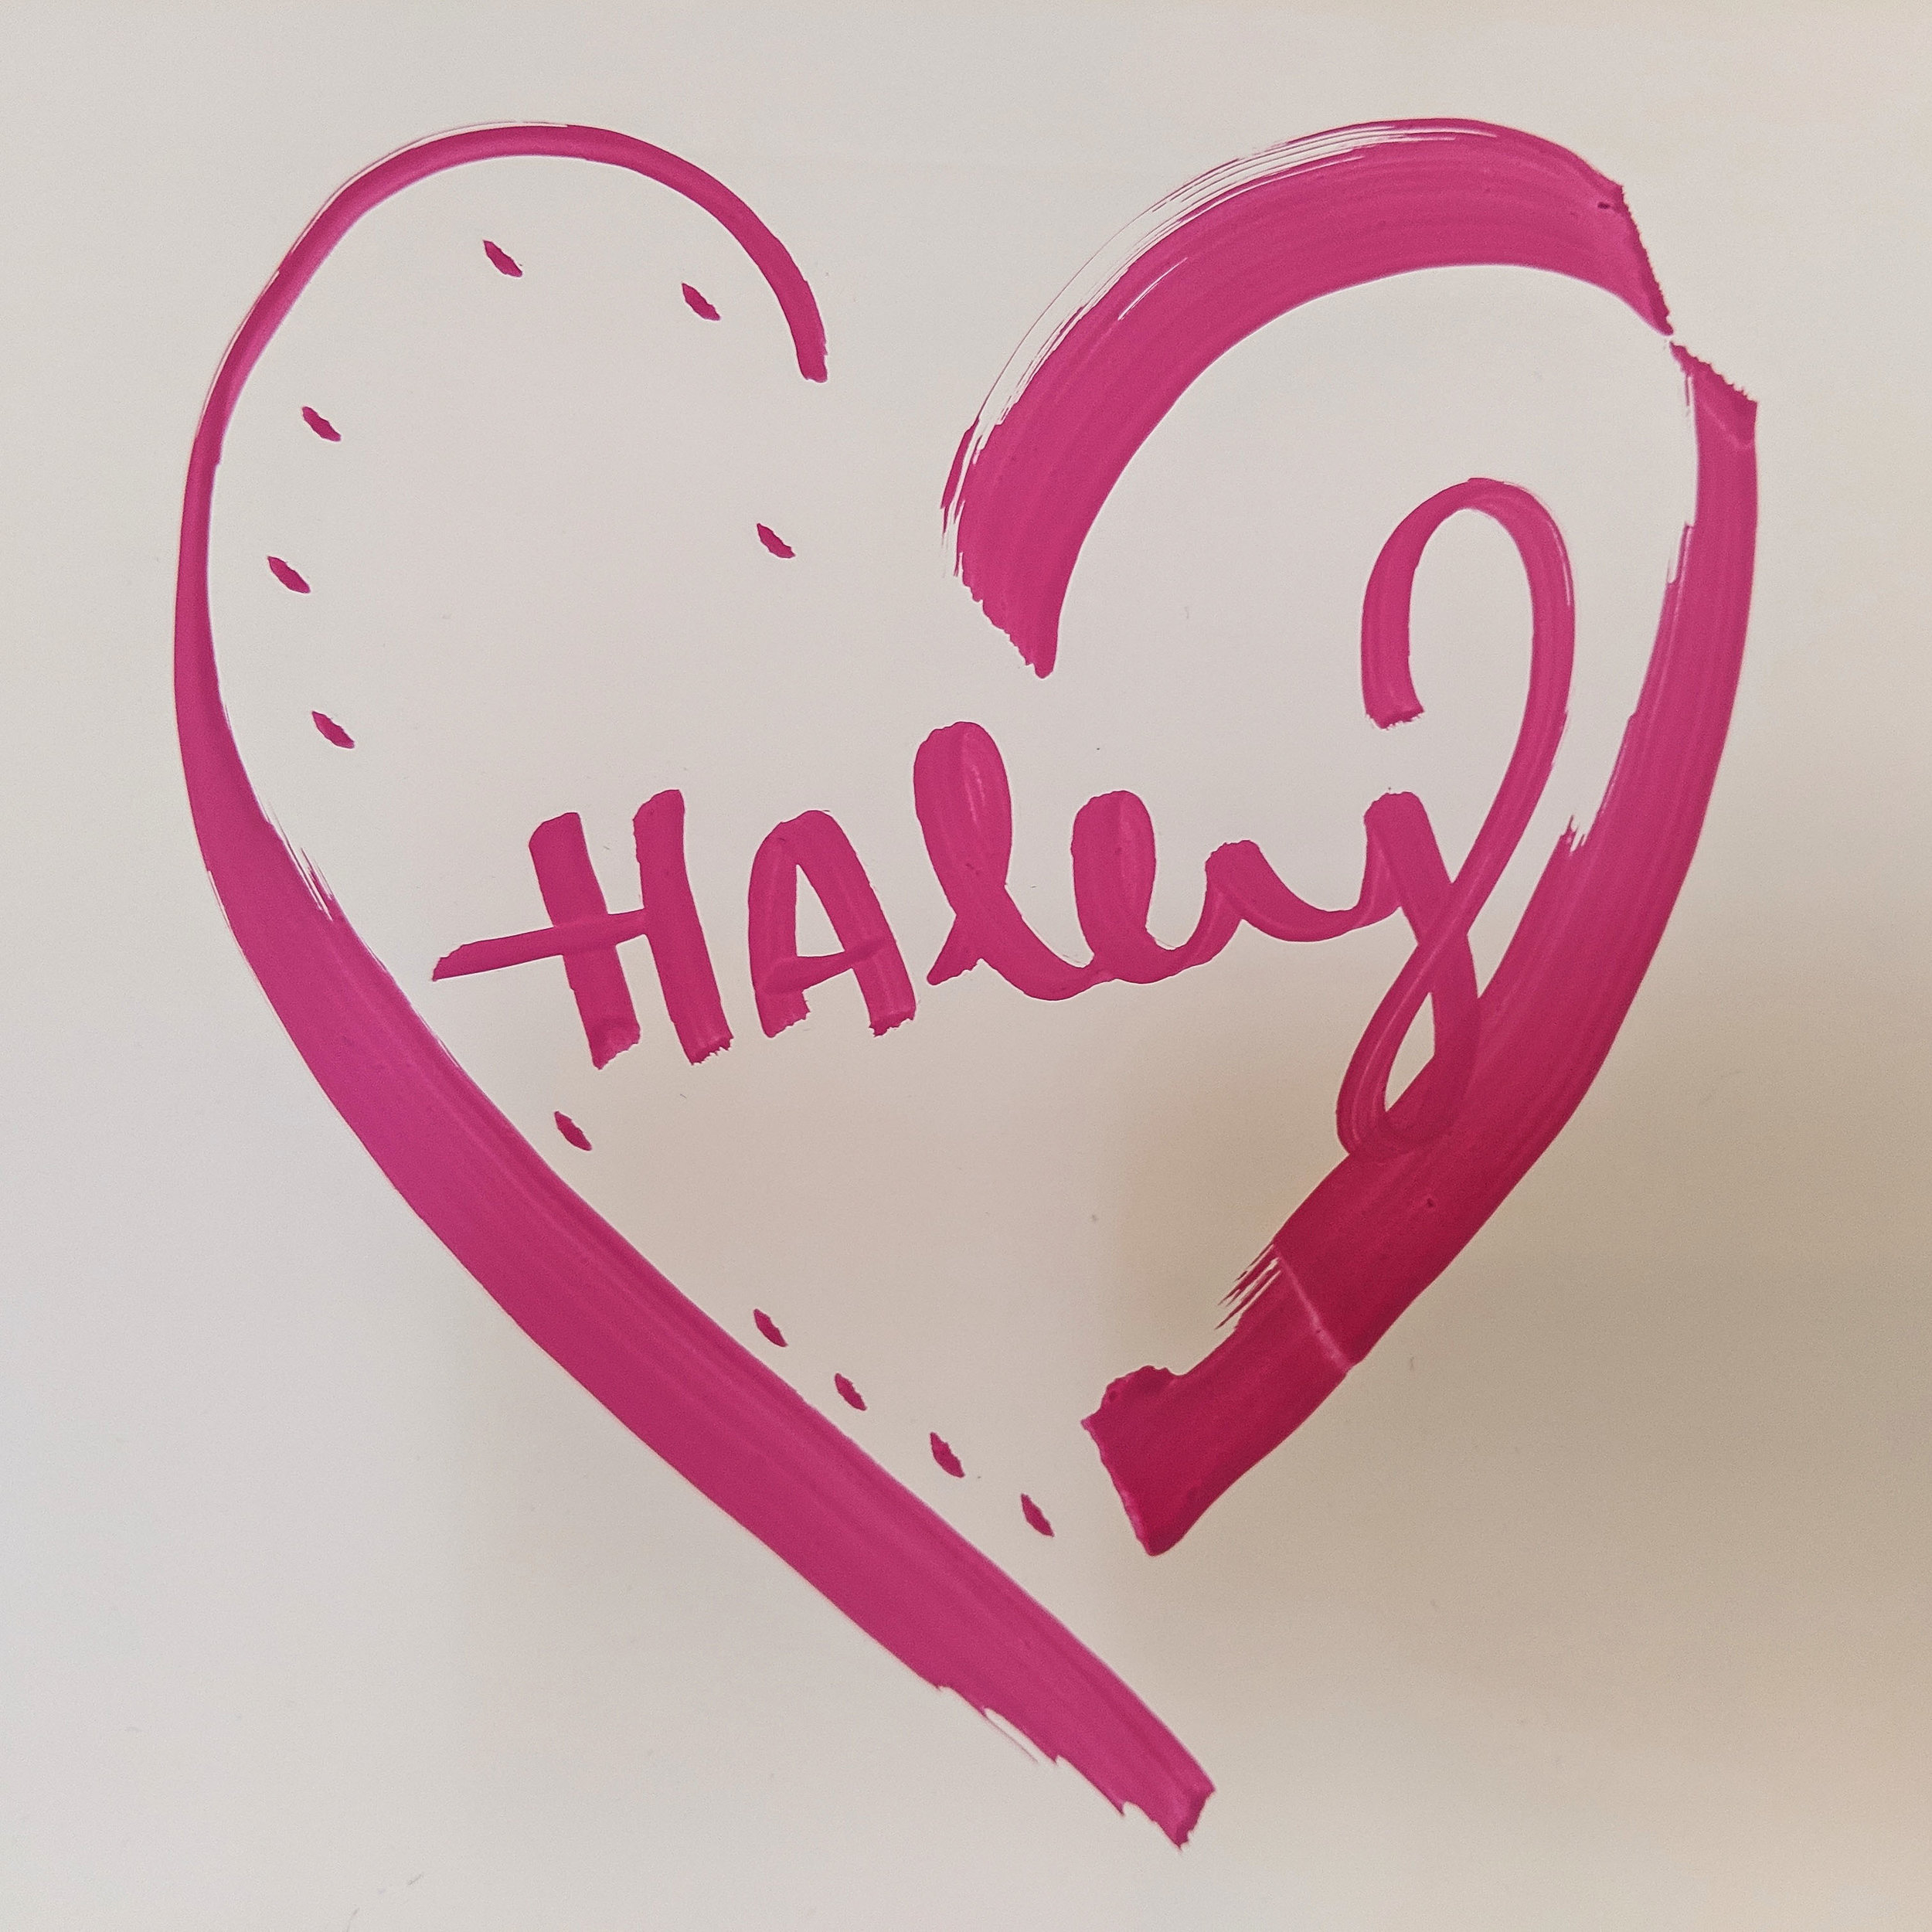 haley-mccallum-drawing.jpg